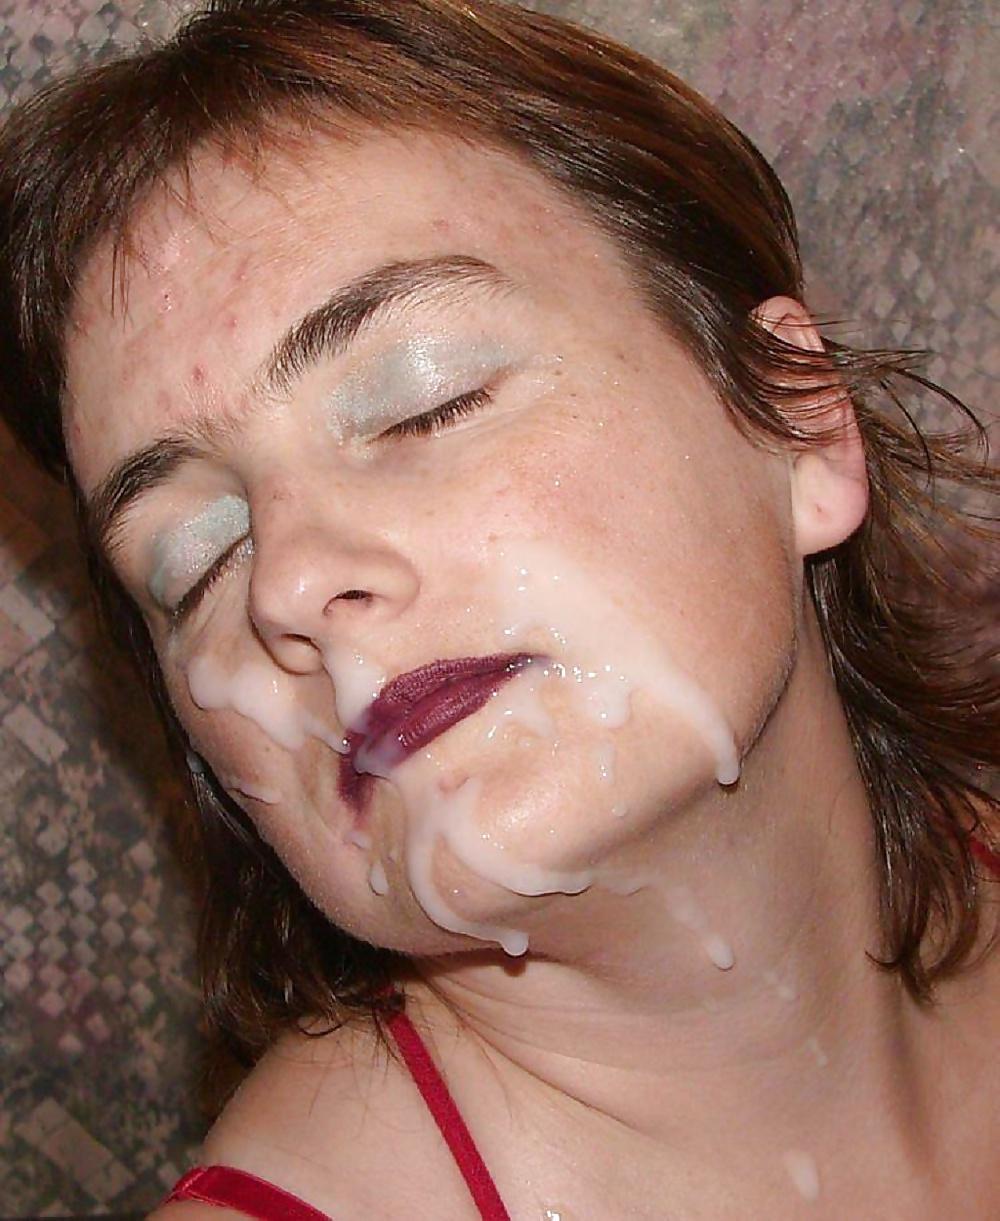 Having unwanted facial vids lehman images